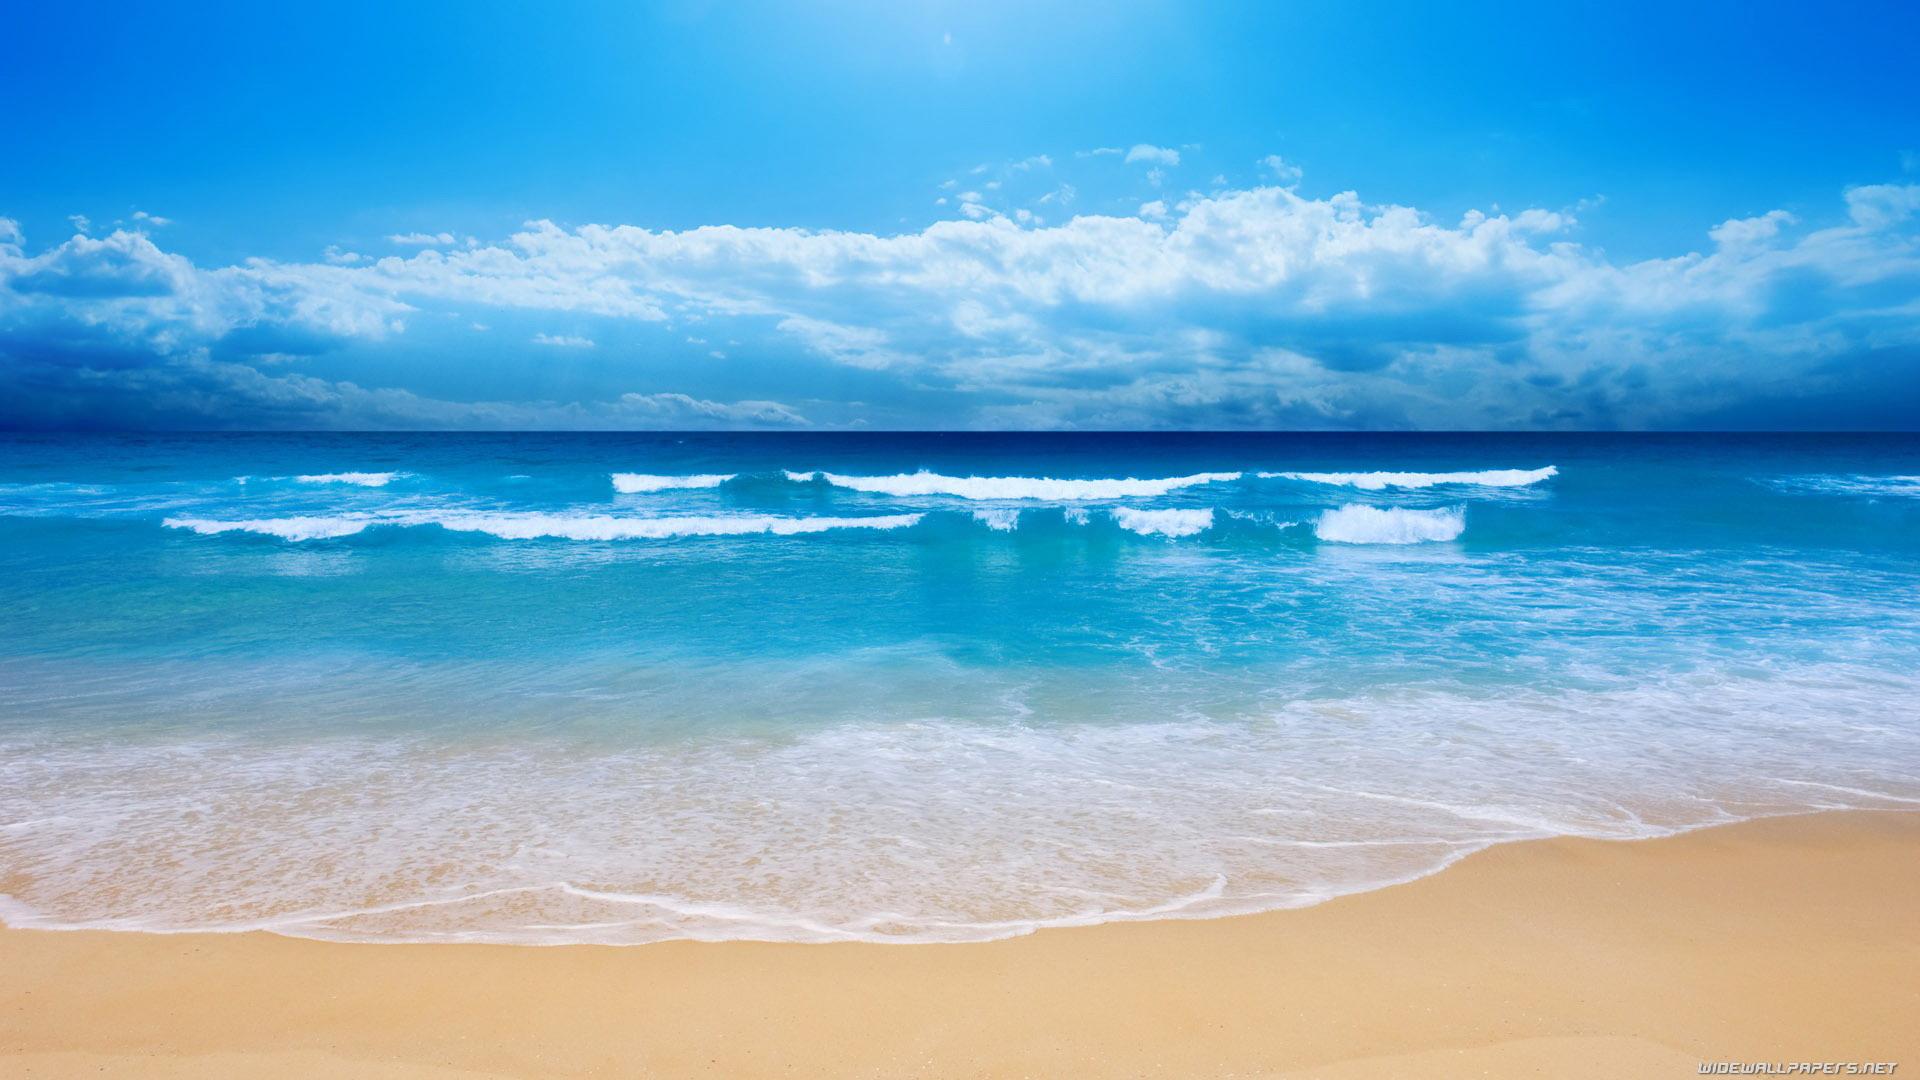 Natural Beautiful Beach HD Wallpaper Hd Wallpapers 1920x1080